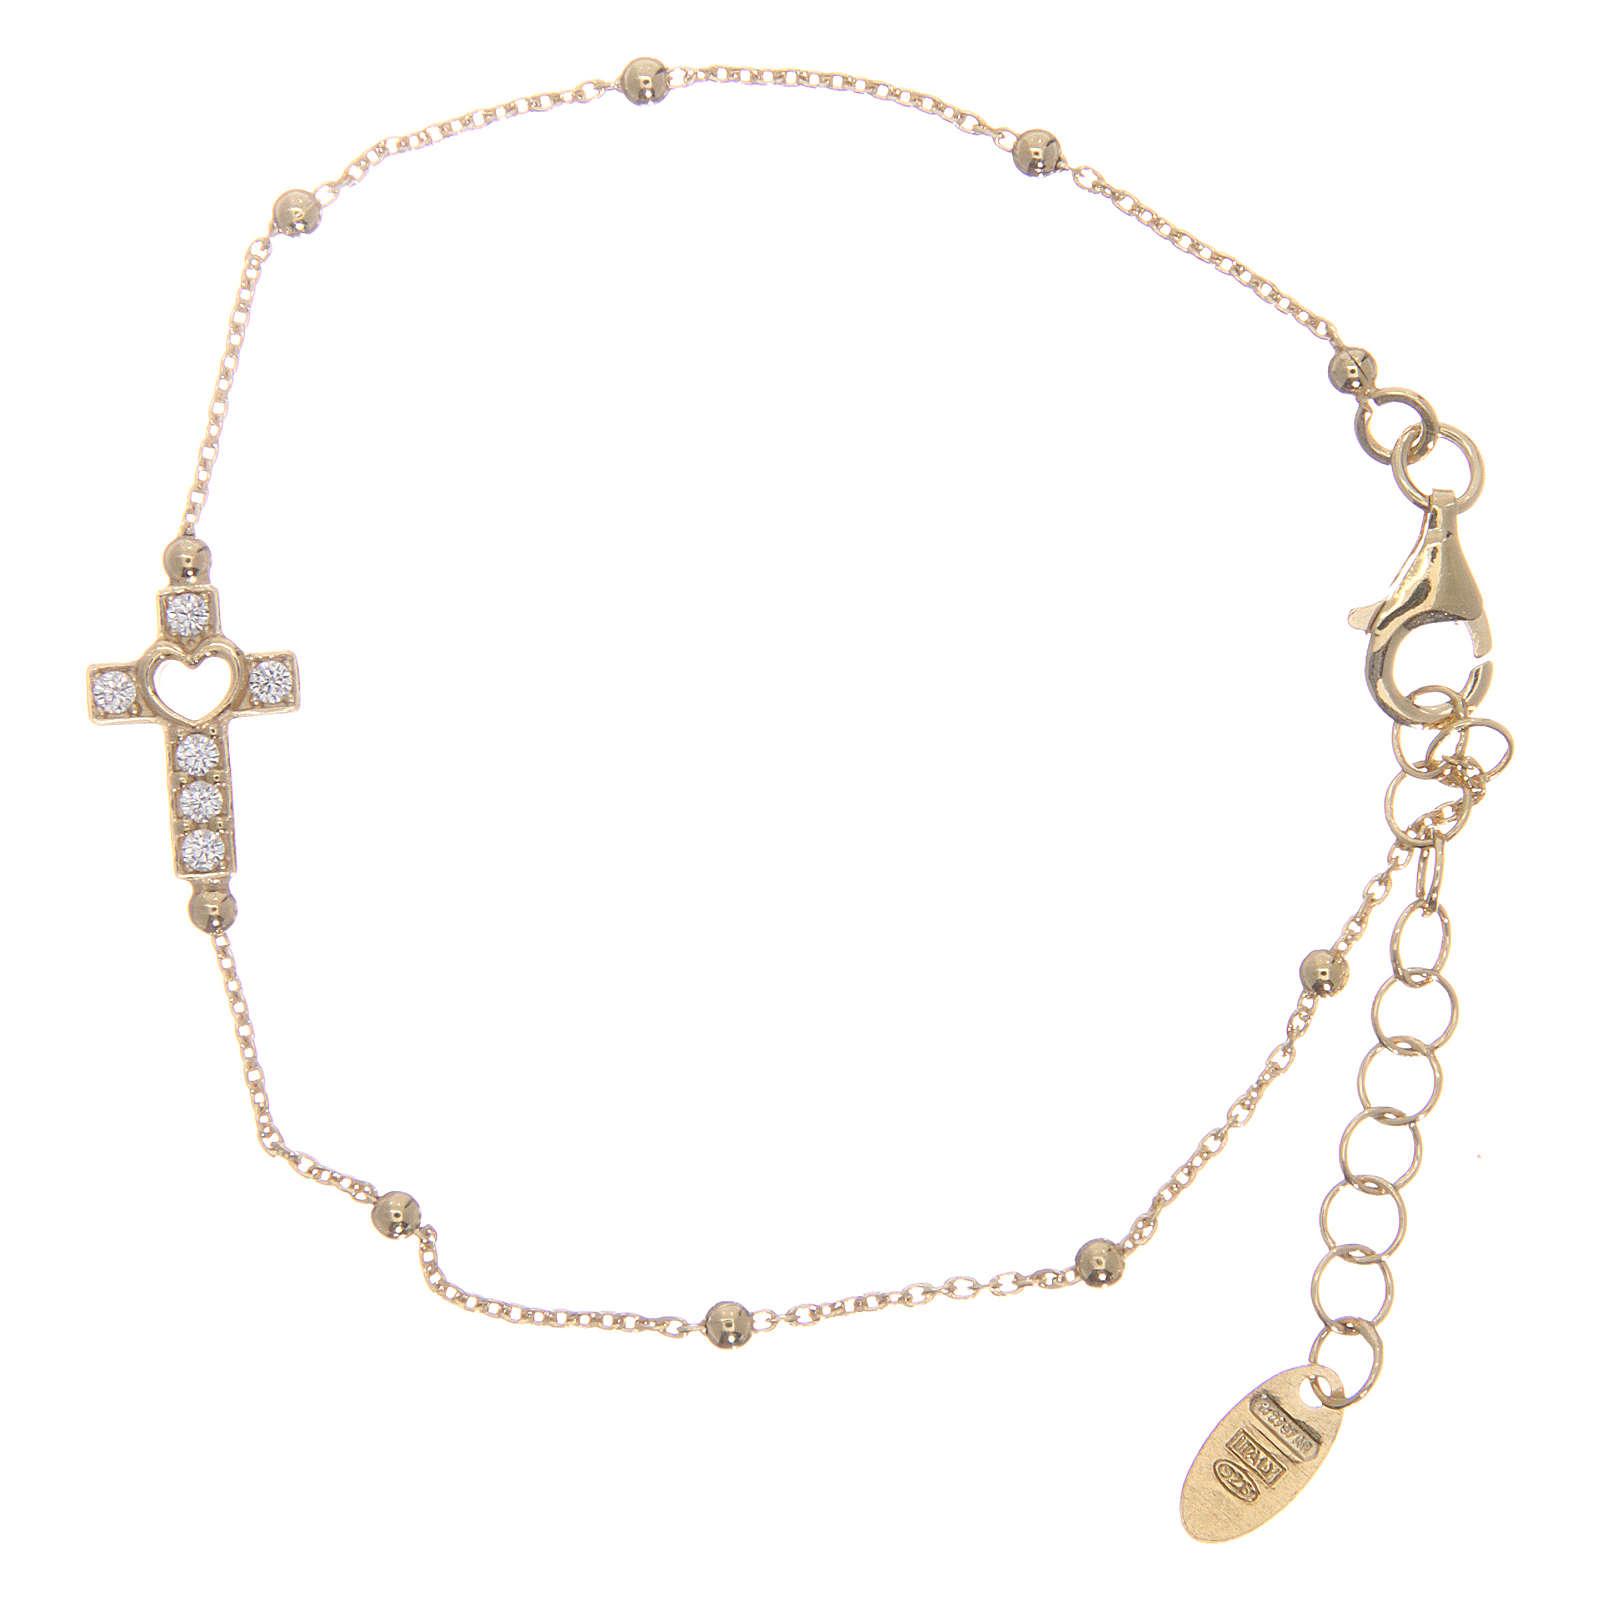 Pulseira AMEN prata 925 ouro zircões brancos 4